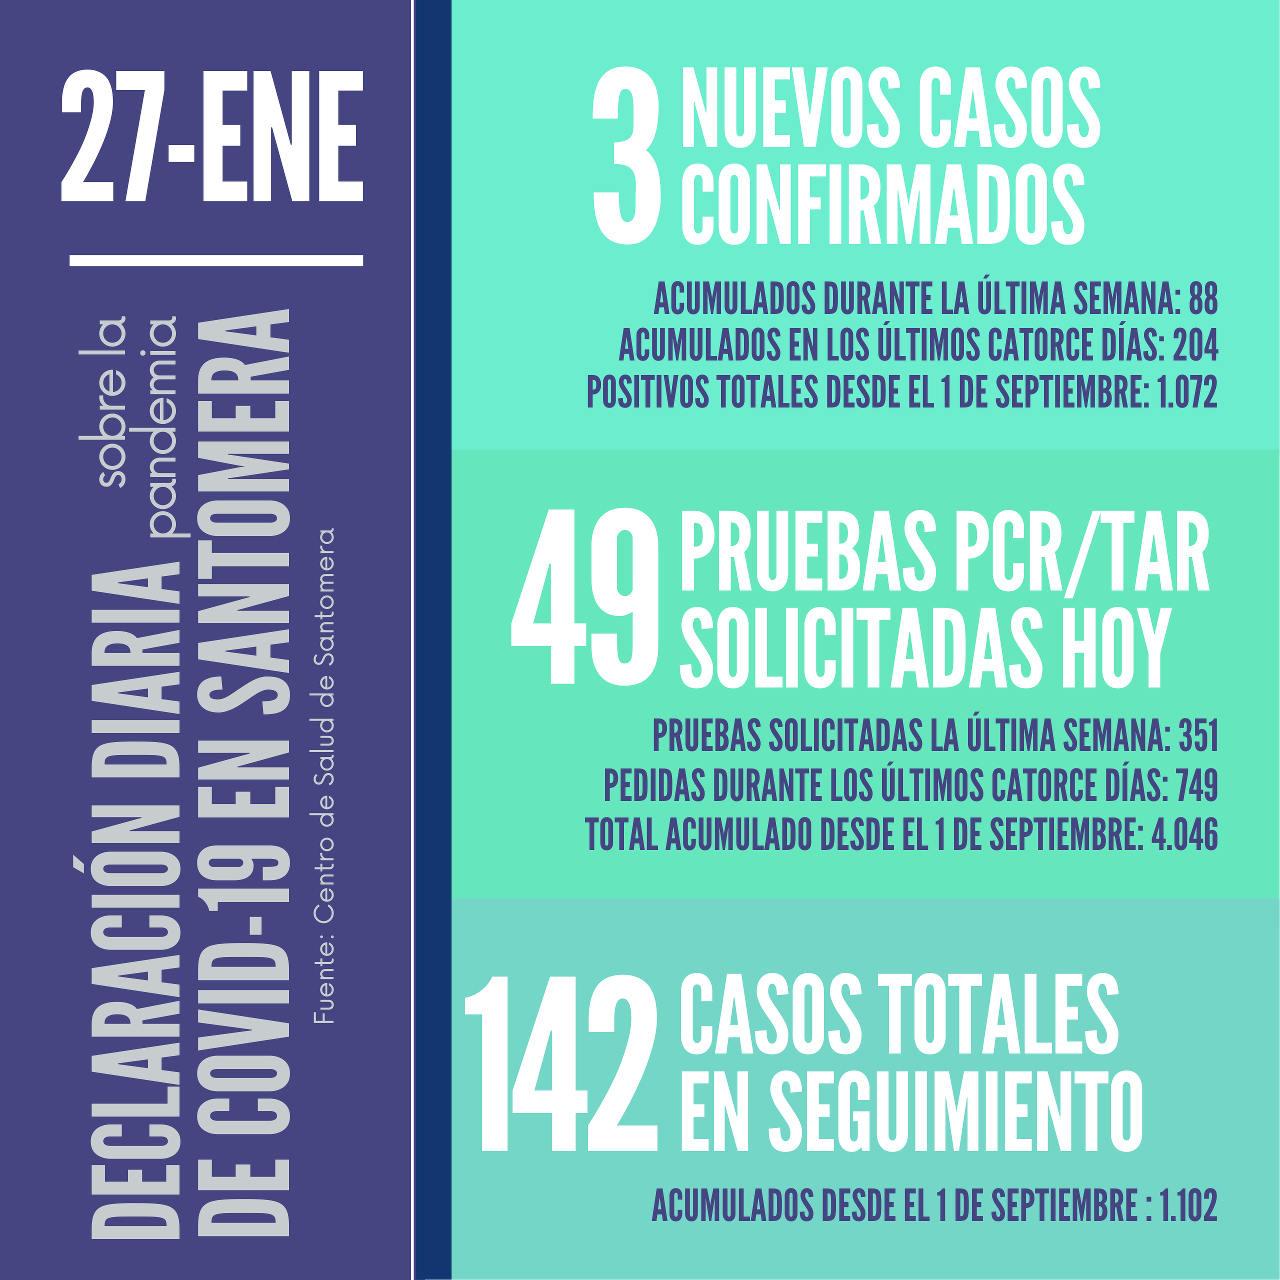 20210127_Datos COVID-19 Santomera